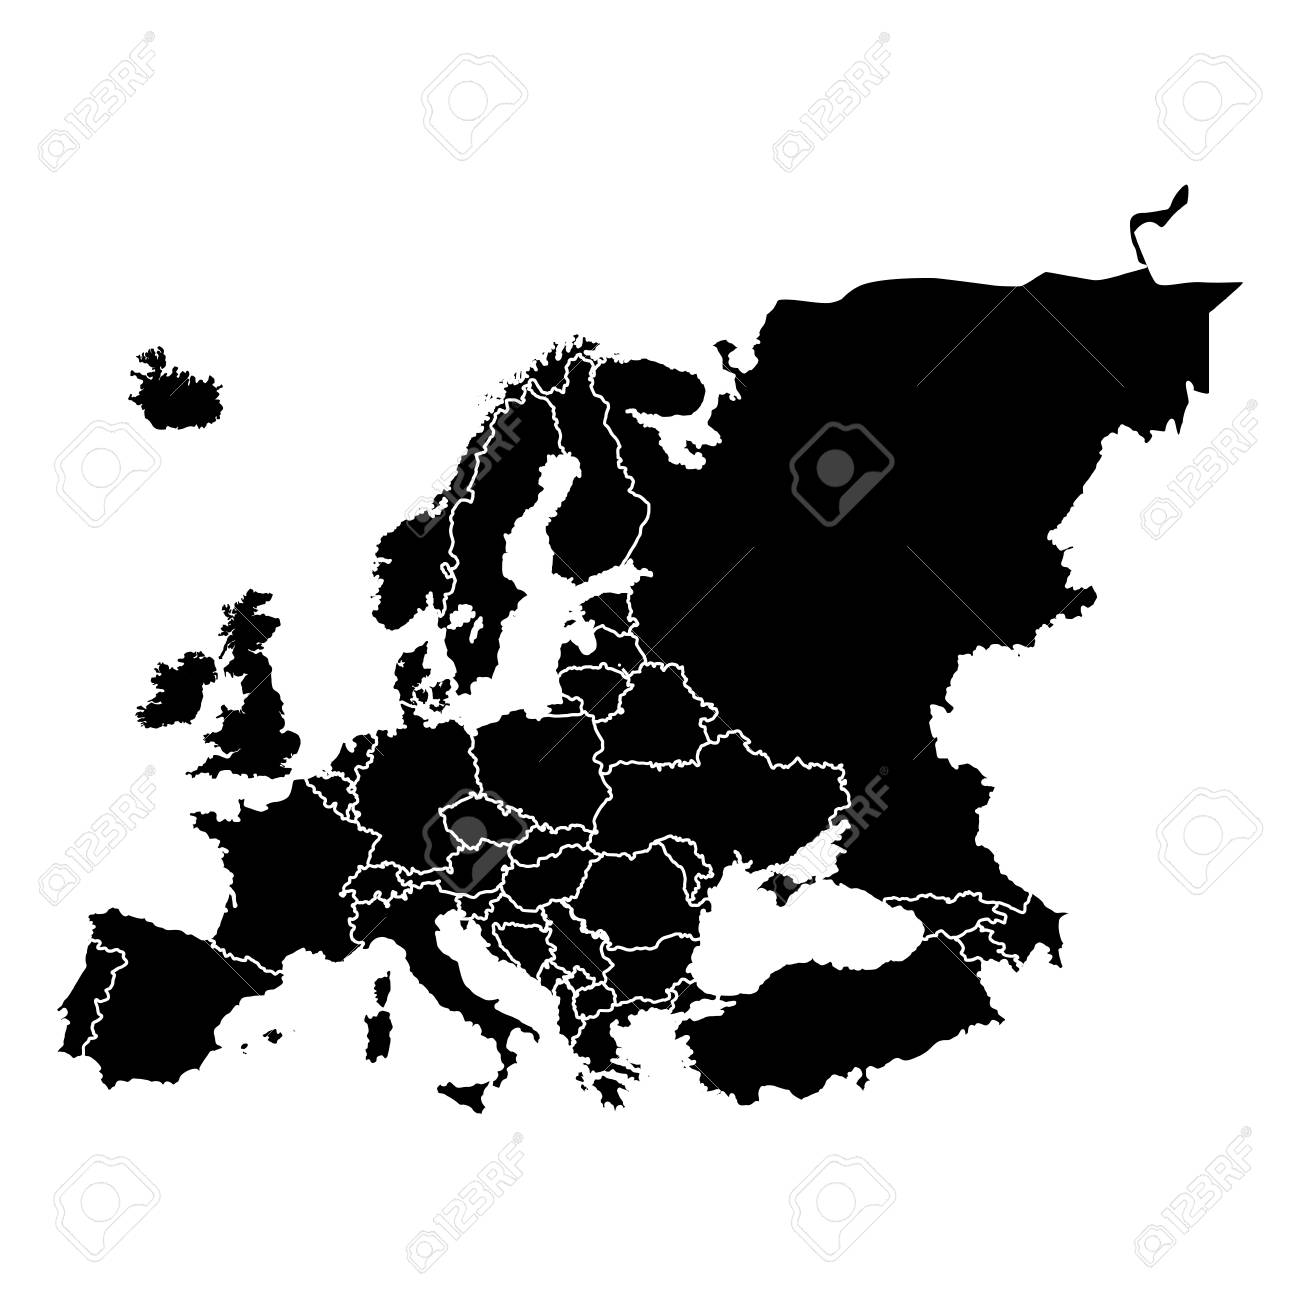 Political map of Europe in black Illustration.